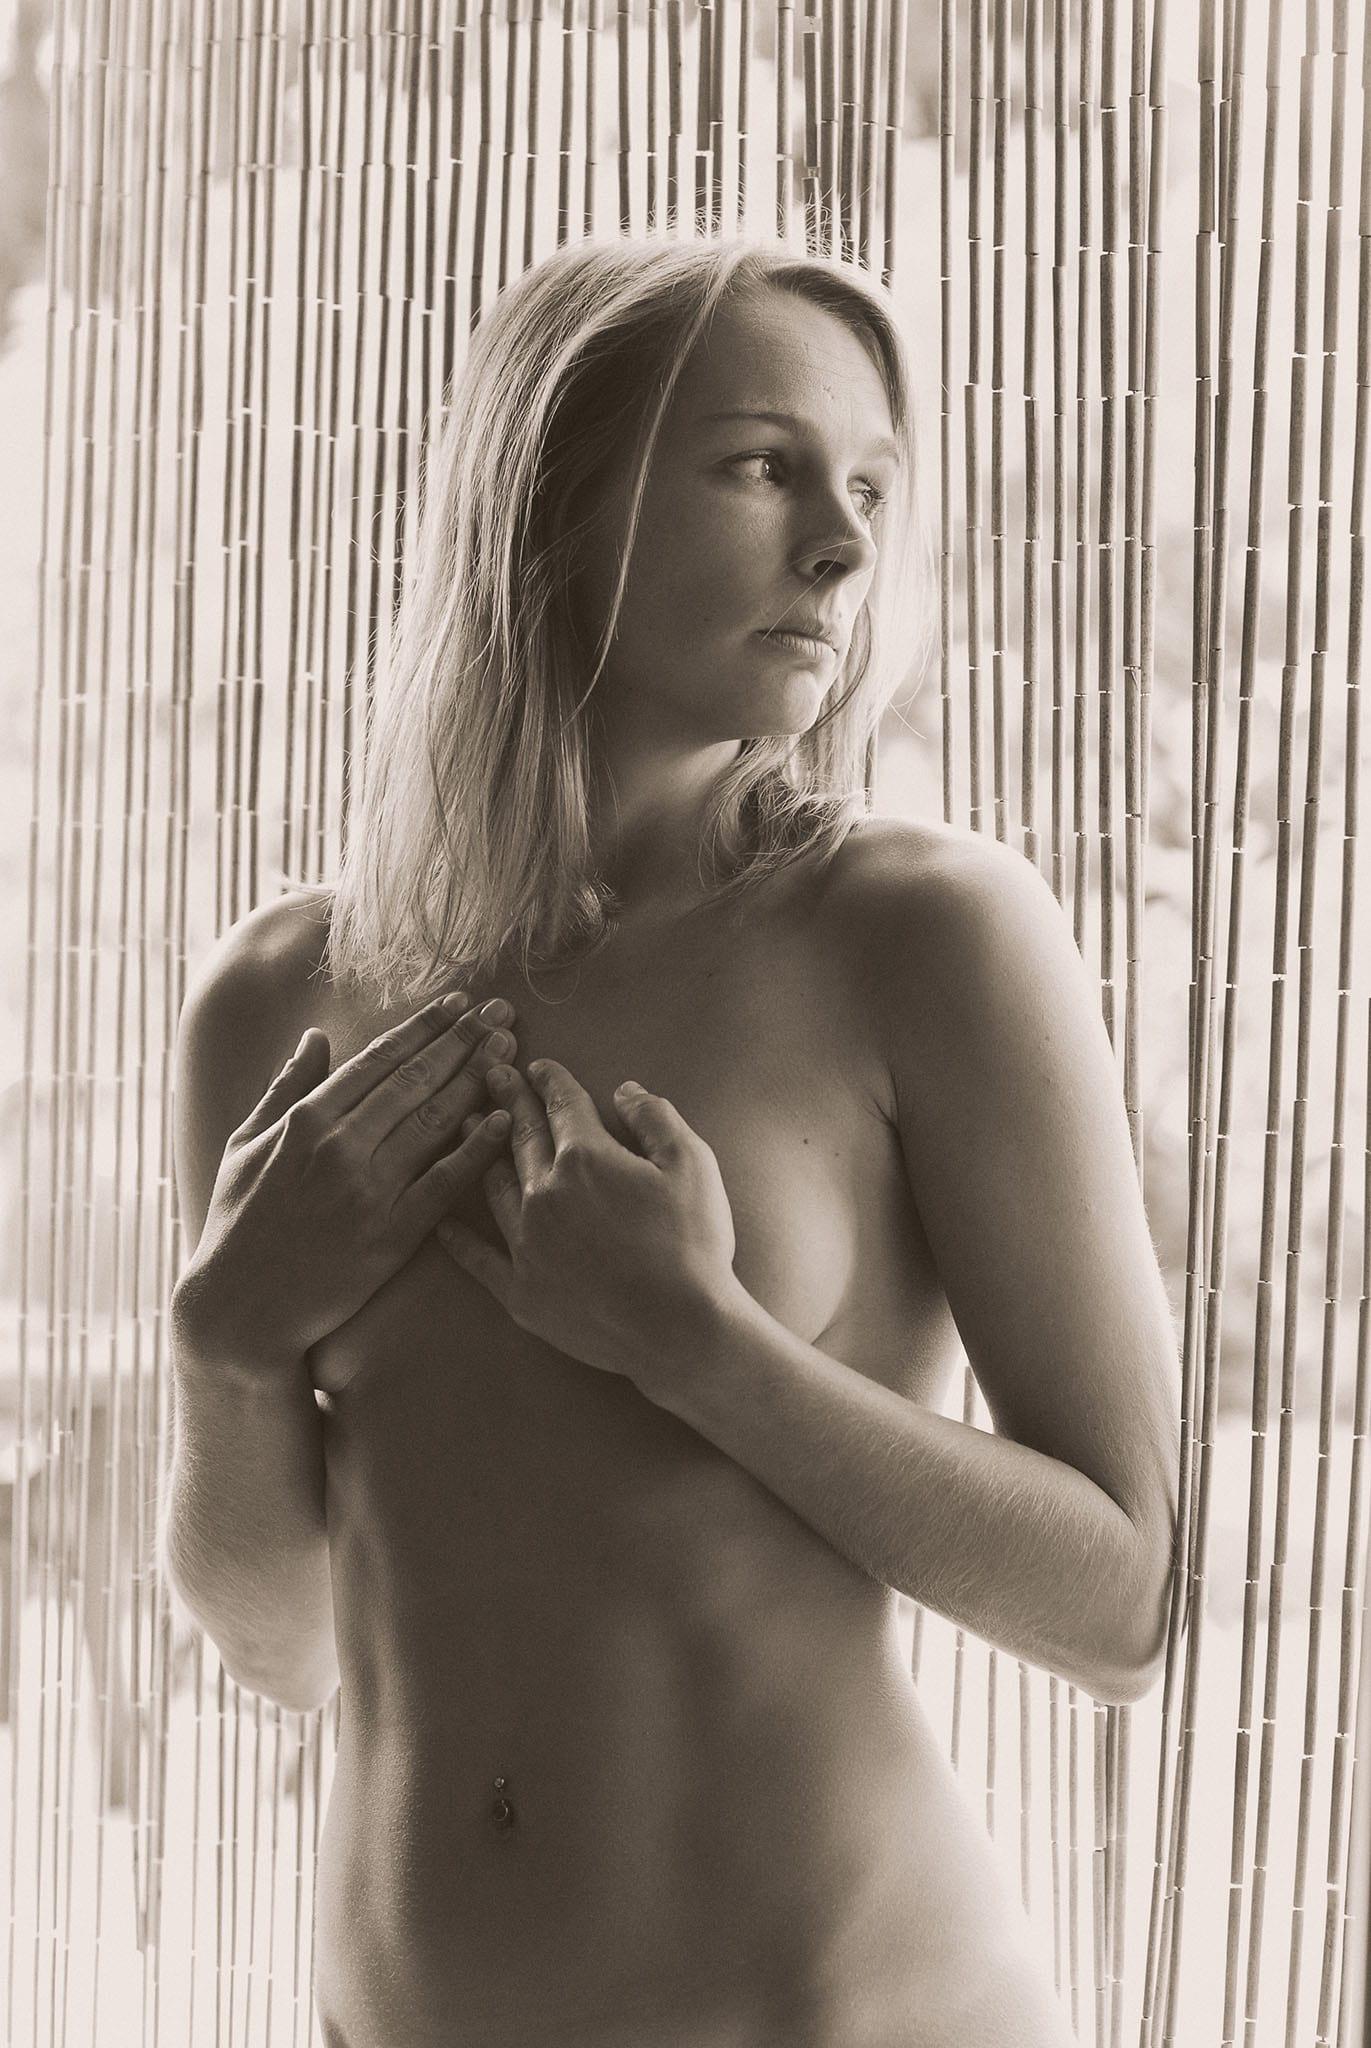 Akt 02 - Akt Nude Act Aktfotografie Erotik Erotic